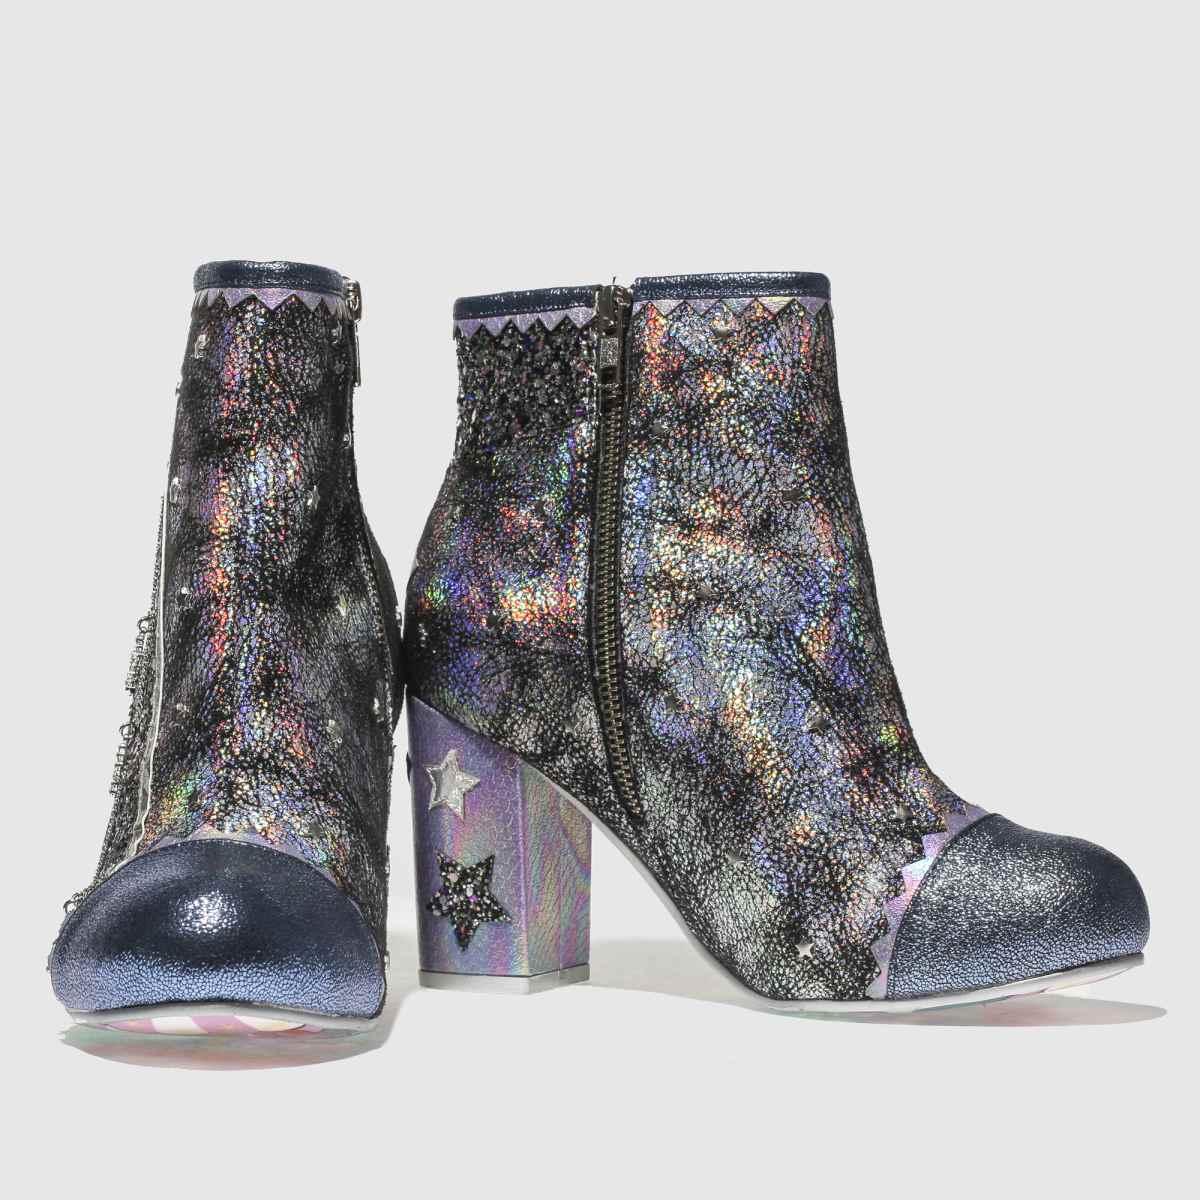 Damen Schwarz-violett irregular choice Major Tom Boots   schuh Gute Qualität beliebte Schuhe